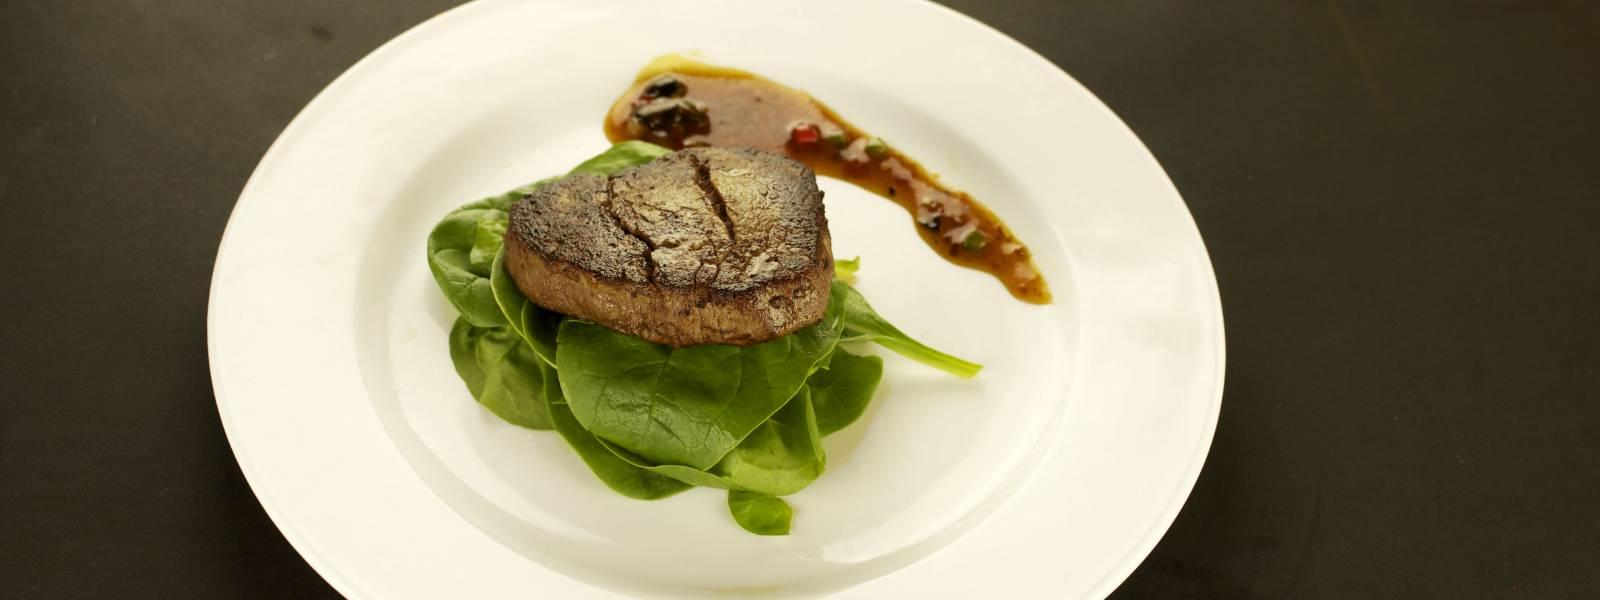 Te Awamutu Restaurant Guide - New Zealand - Eatout.nz